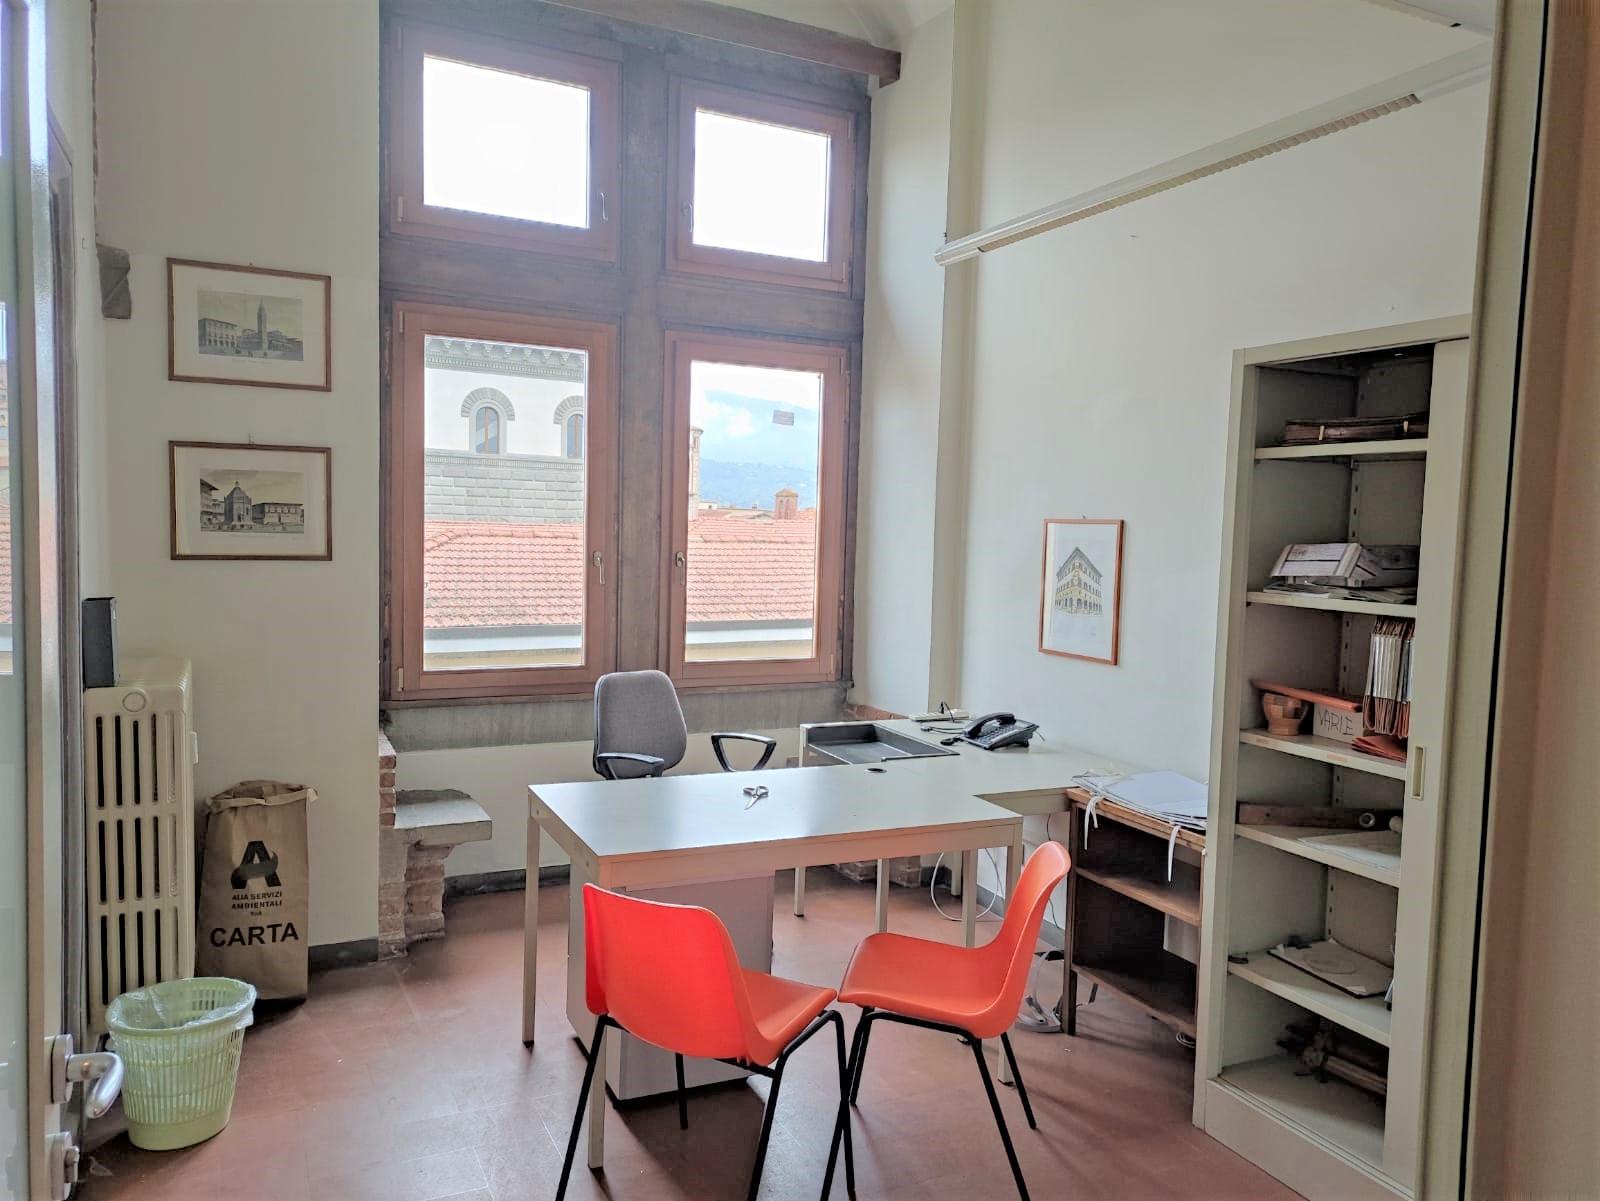 centro storico,Pistoia,51100,1 BagnoBathrooms,Ufficio,centro storico,1472